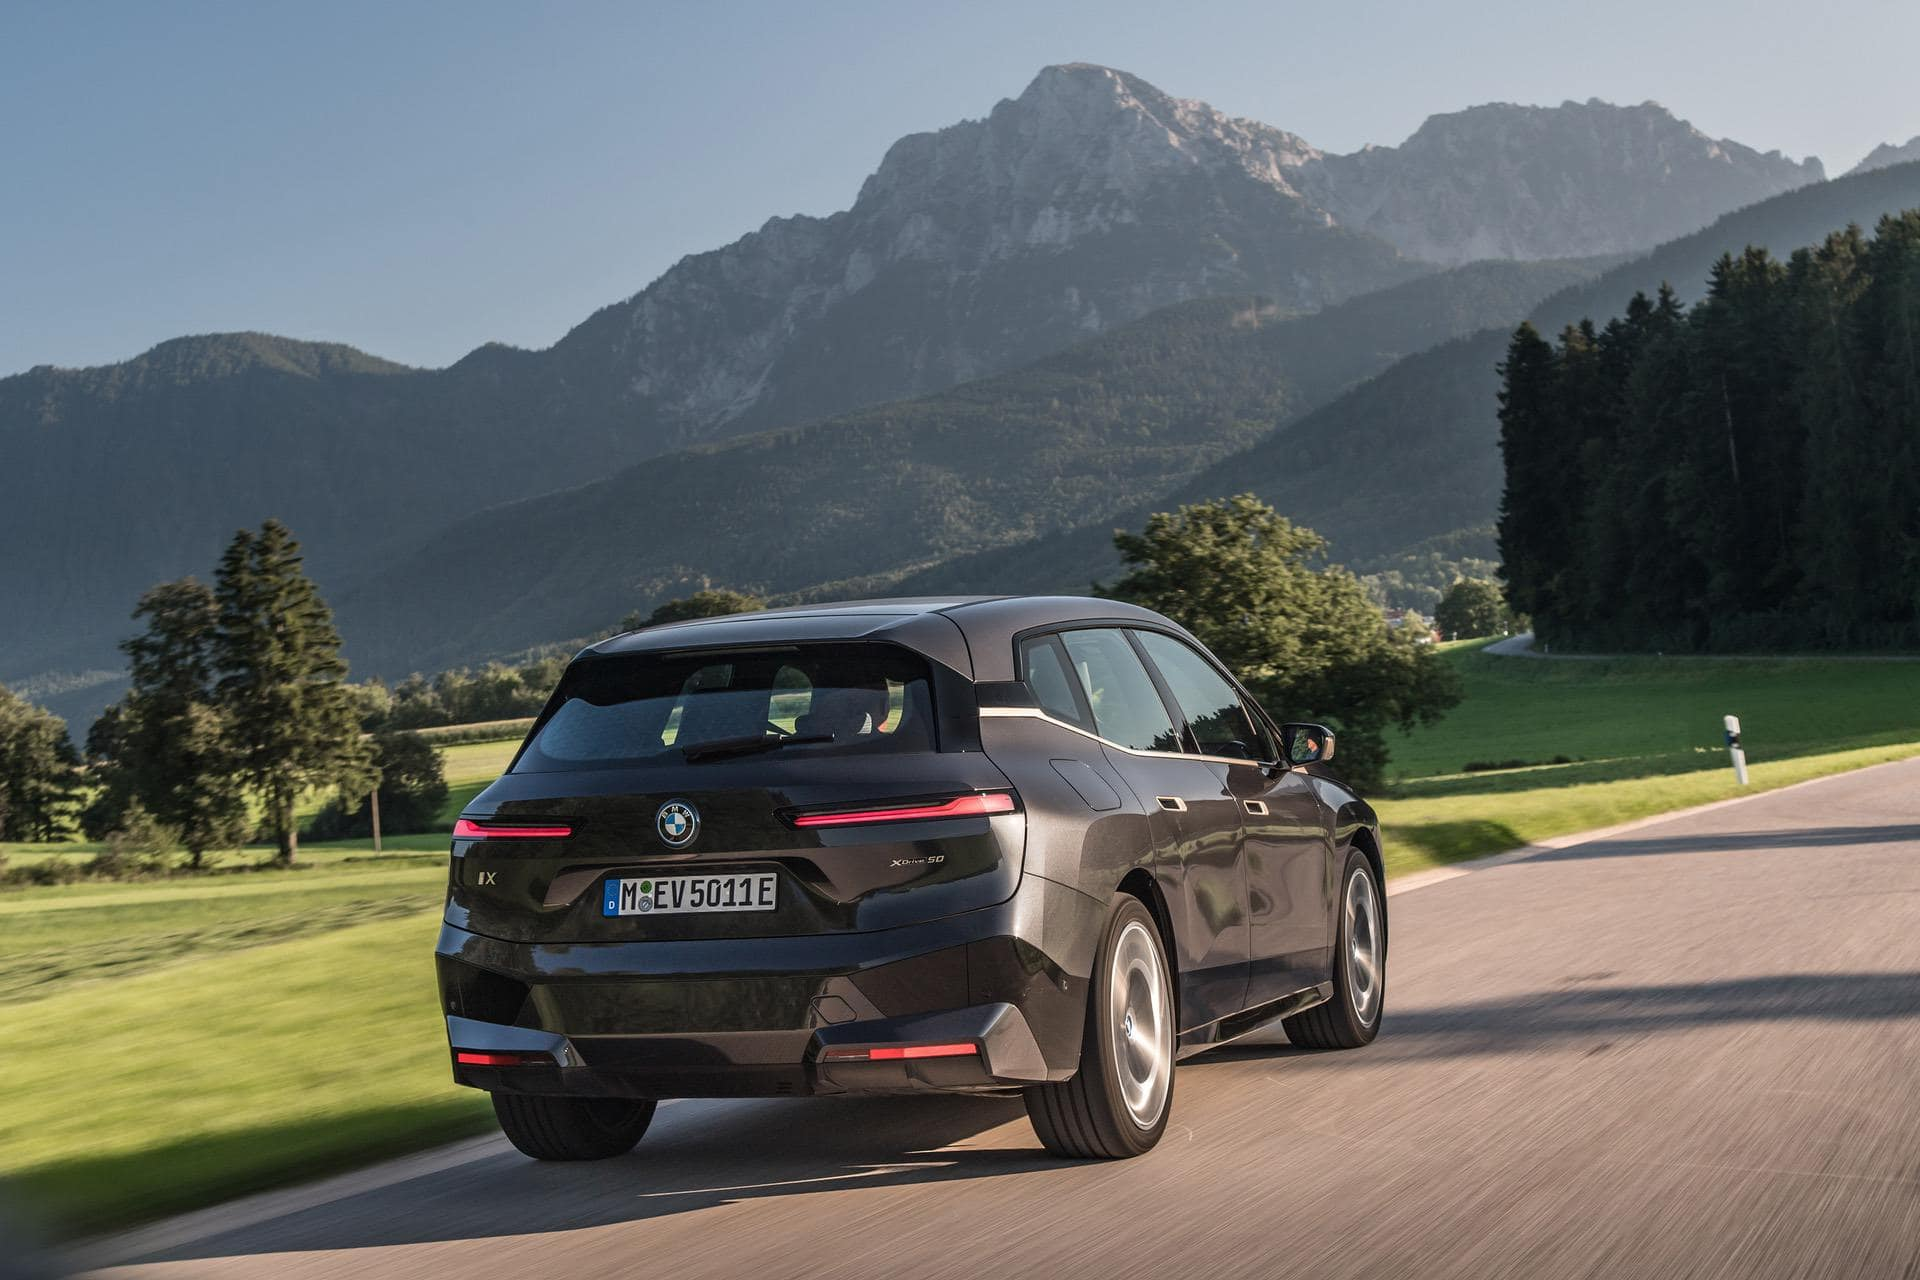 TEST DRIVE: 2022 BMW iX xDrive50 – The Bavarian Magic Carpet